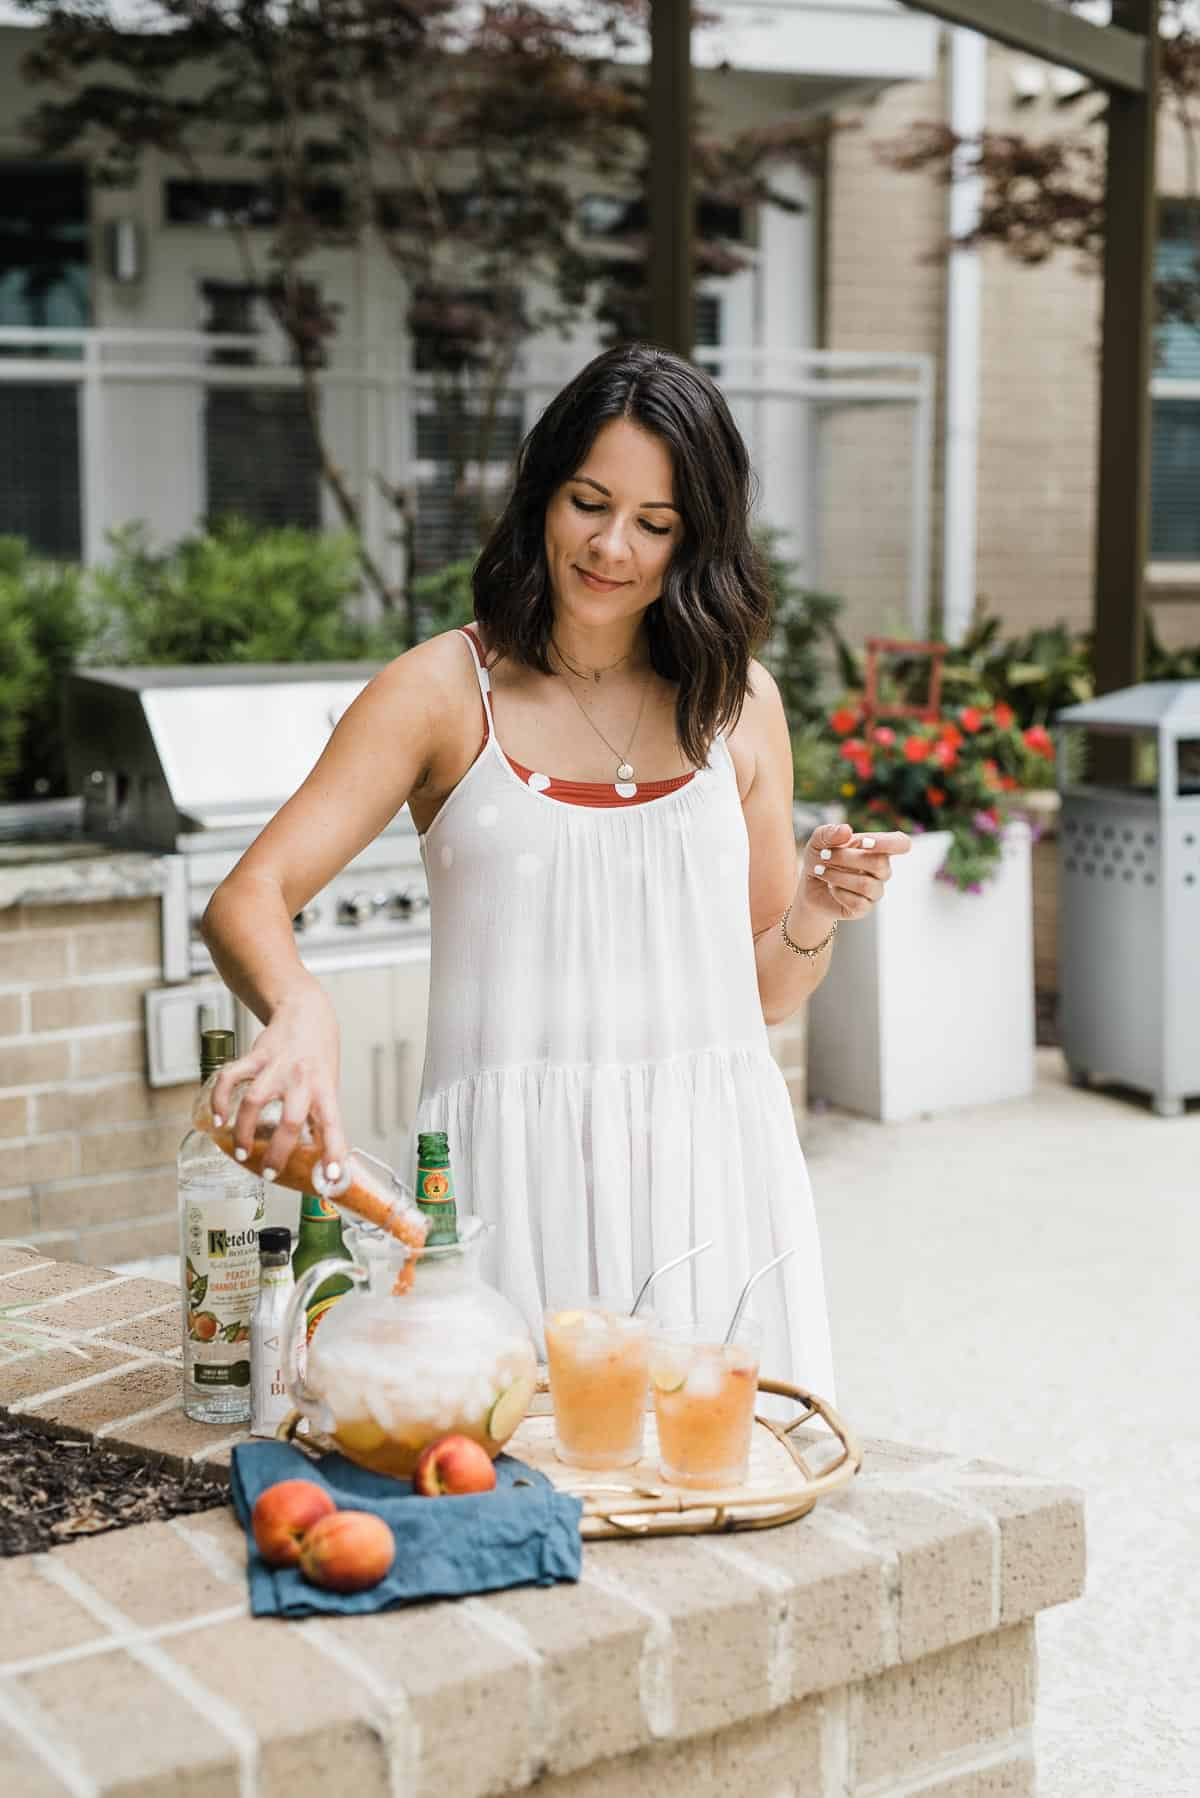 Jessica Camerata is sharing a Peach Moscow Mule Recipe